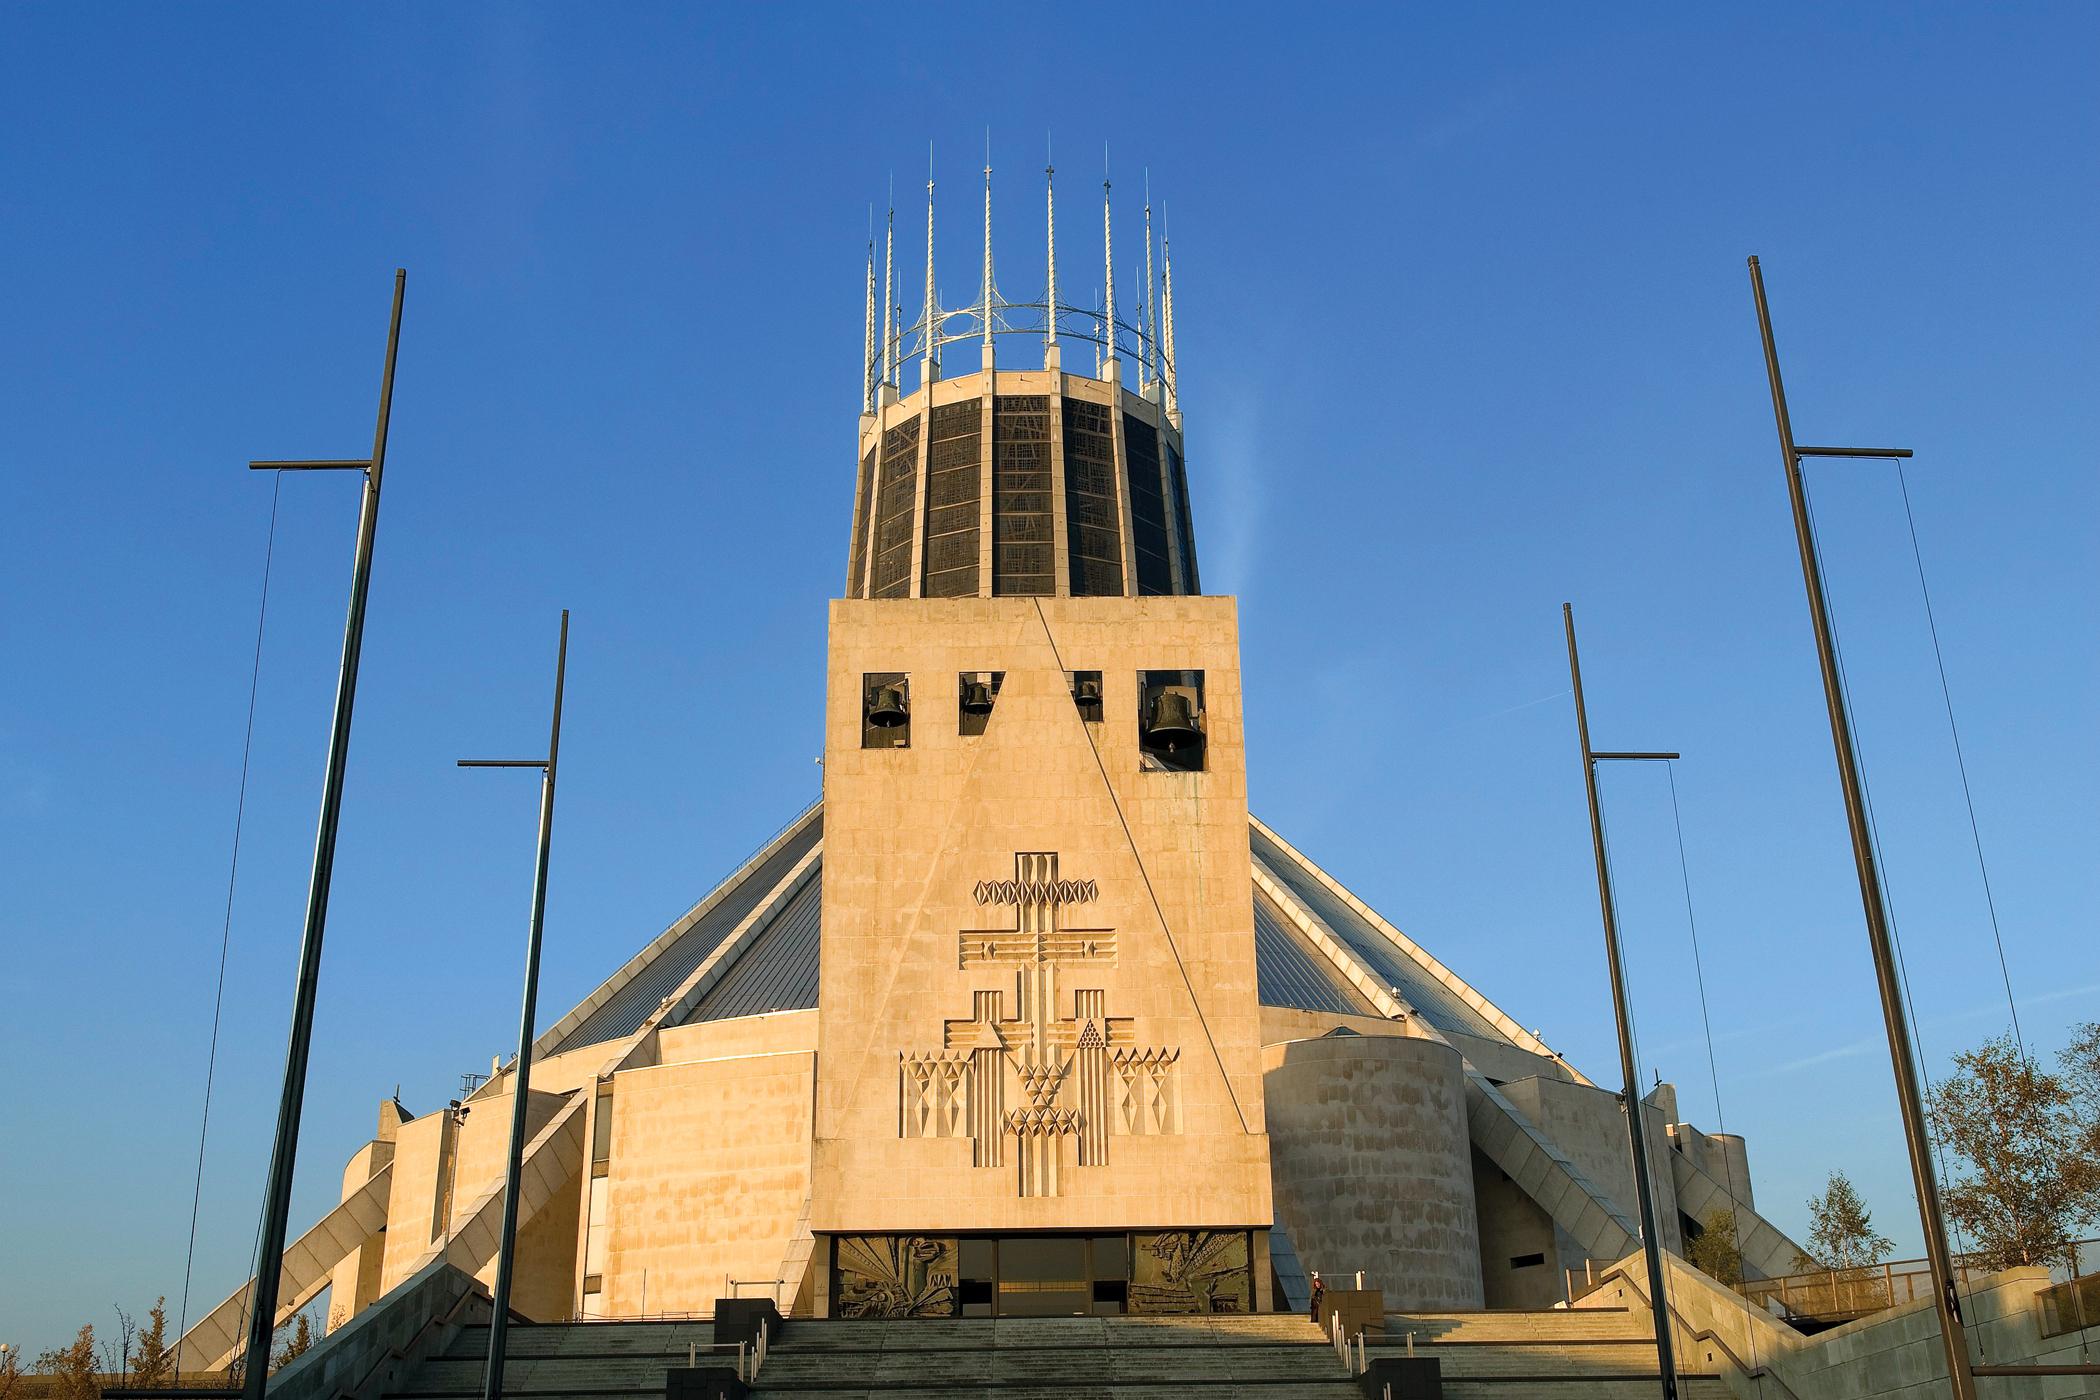 Randi Krisztus-templom